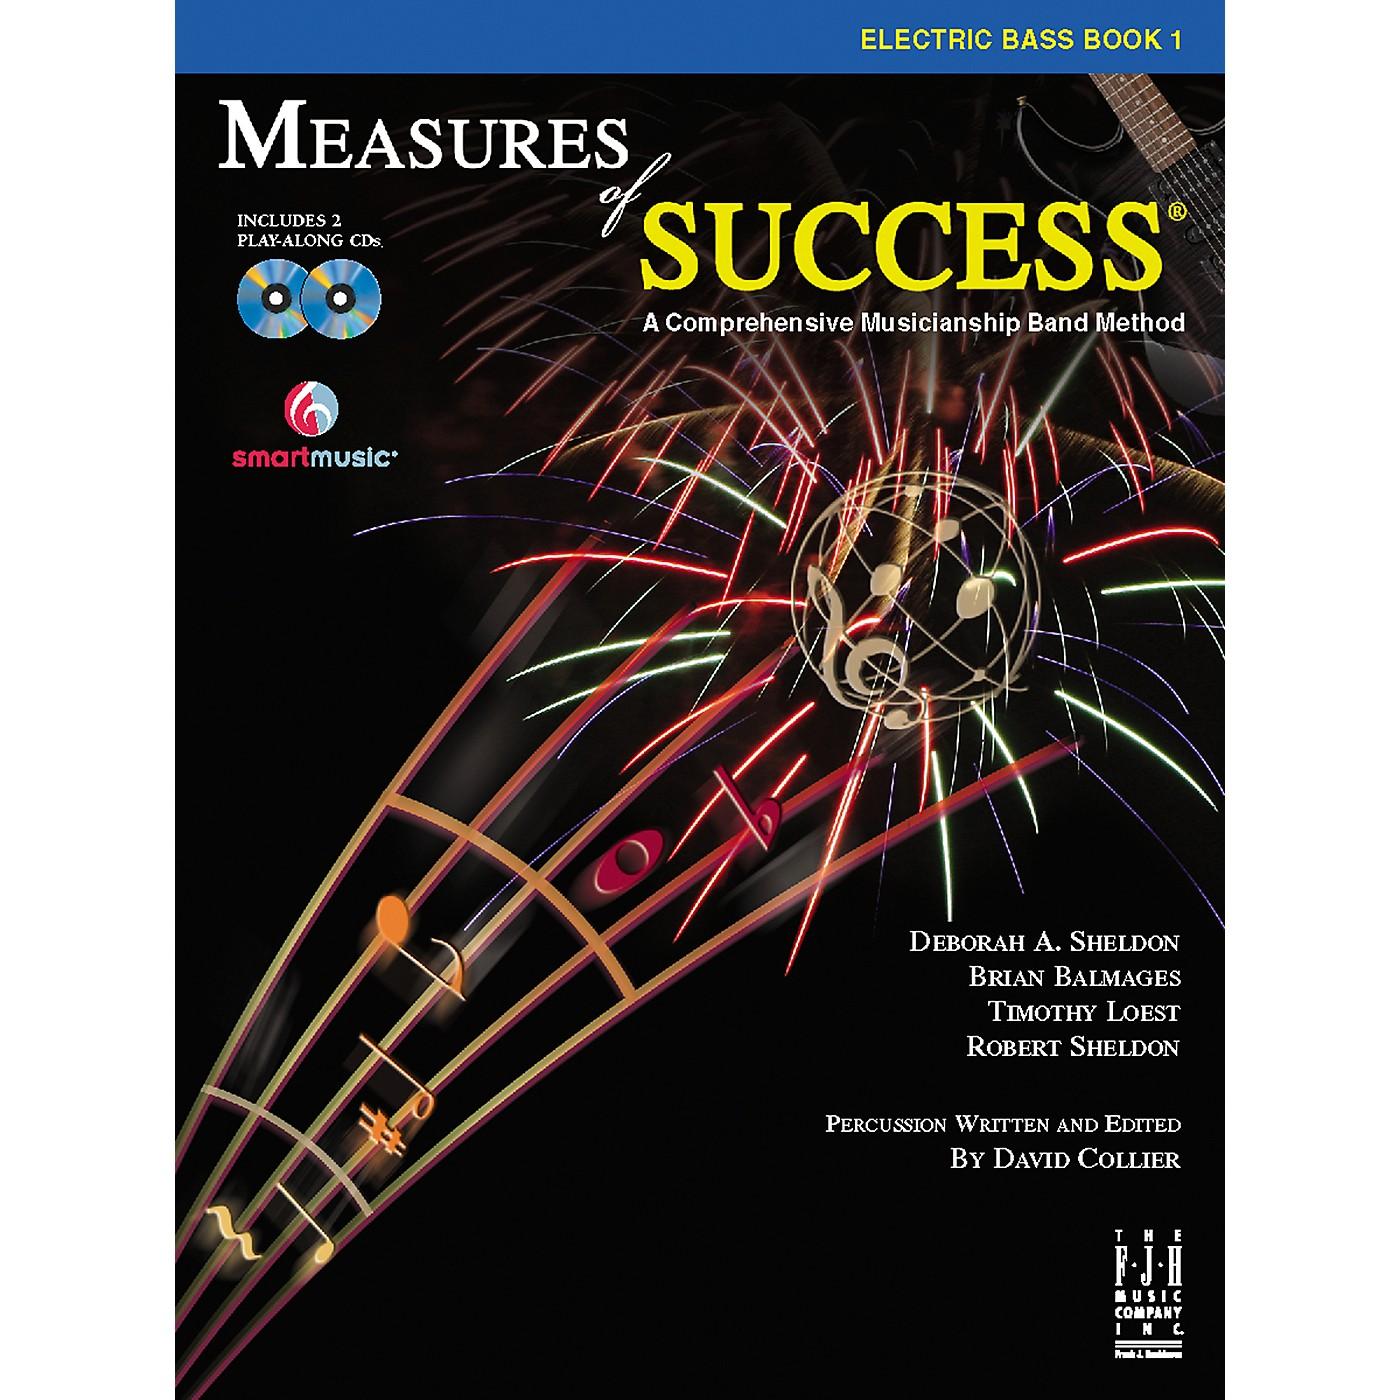 FJH Music Measures of Success Electric Bass Book 1 thumbnail